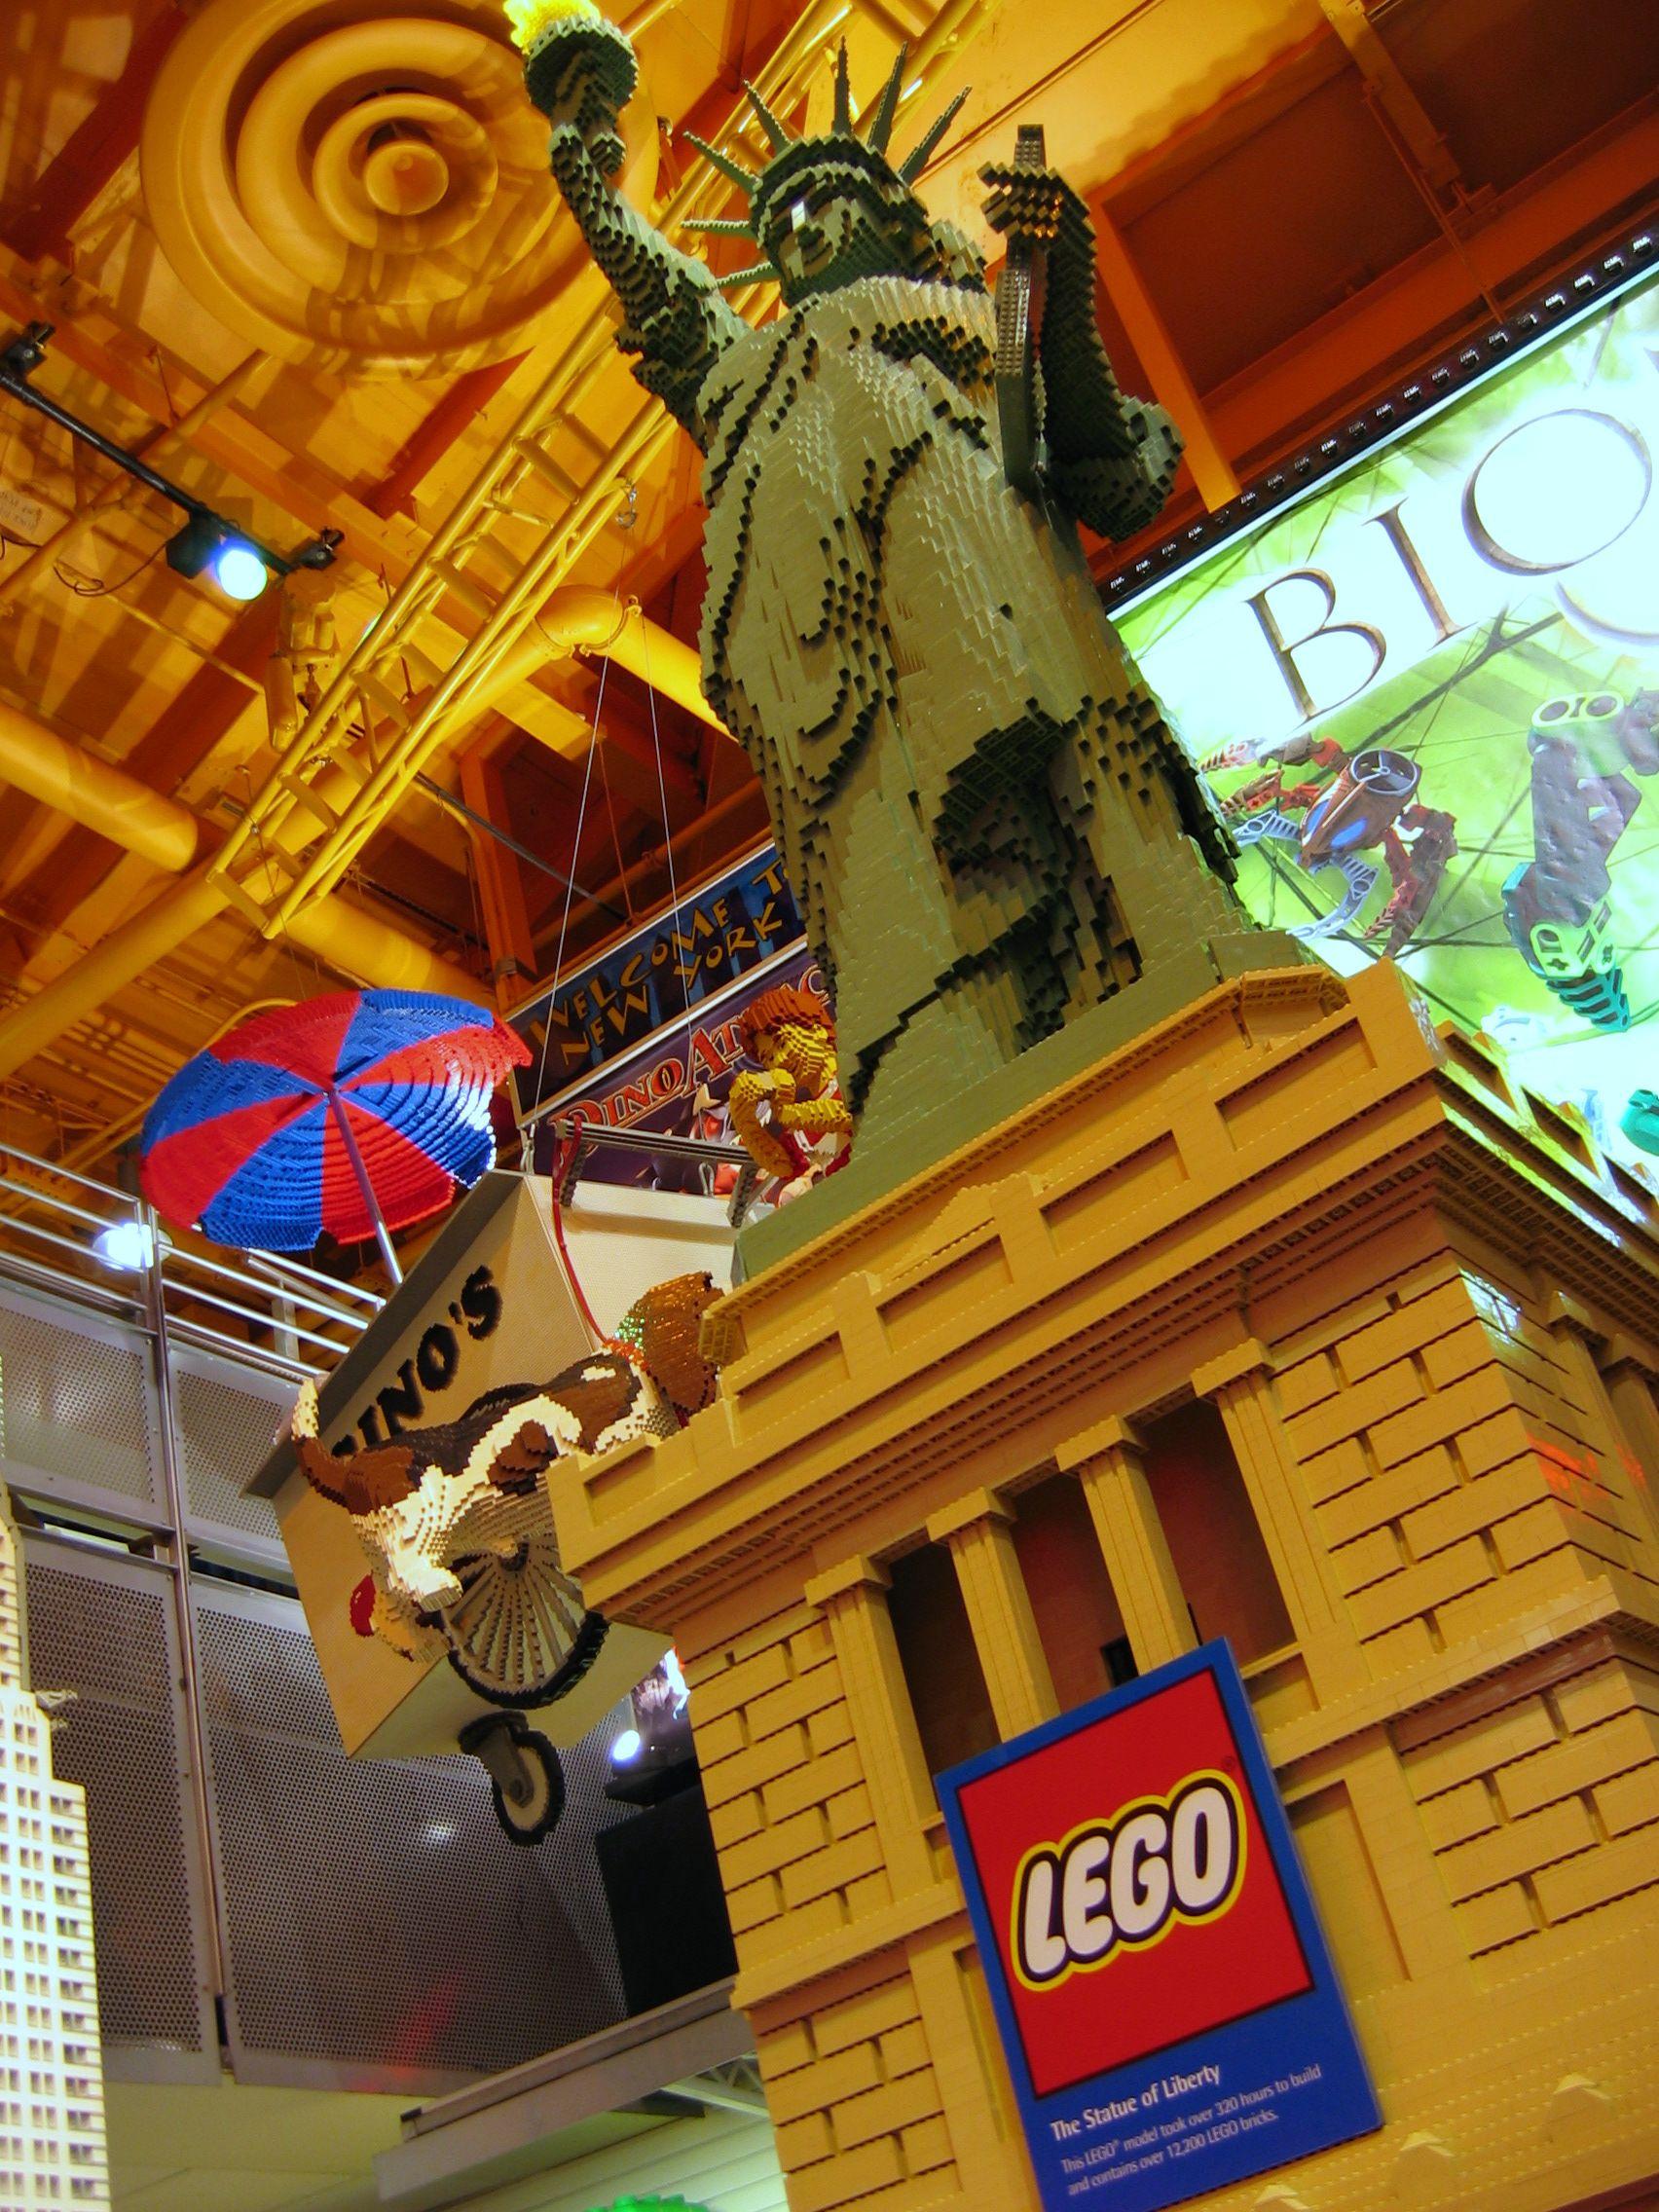 Nyc The Lego Store Nyc Christmas New York Christmas Lego Store